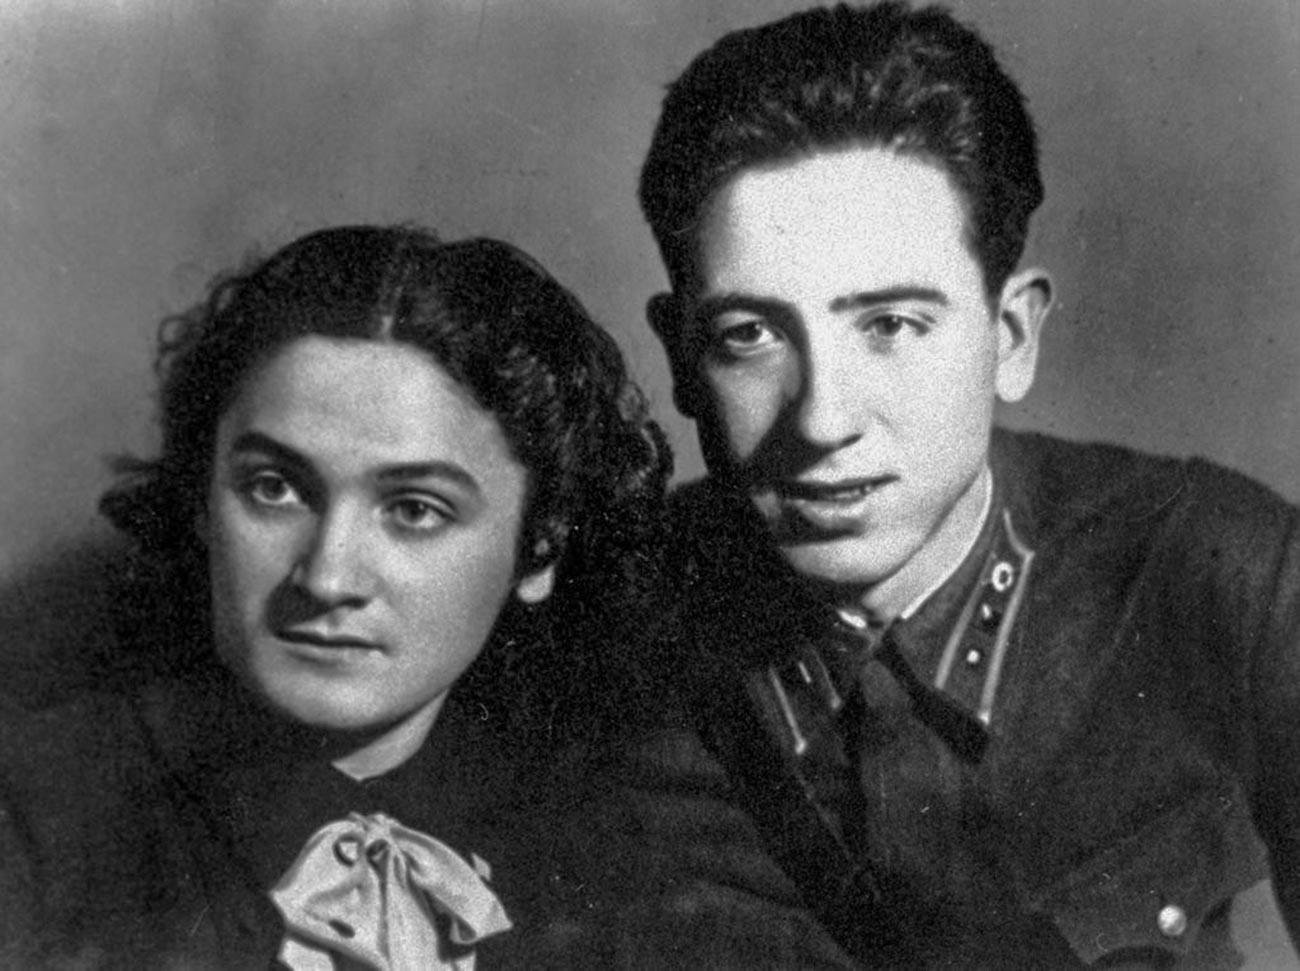 Rubén Ruiz Ibárruri et sa sœur Amaya